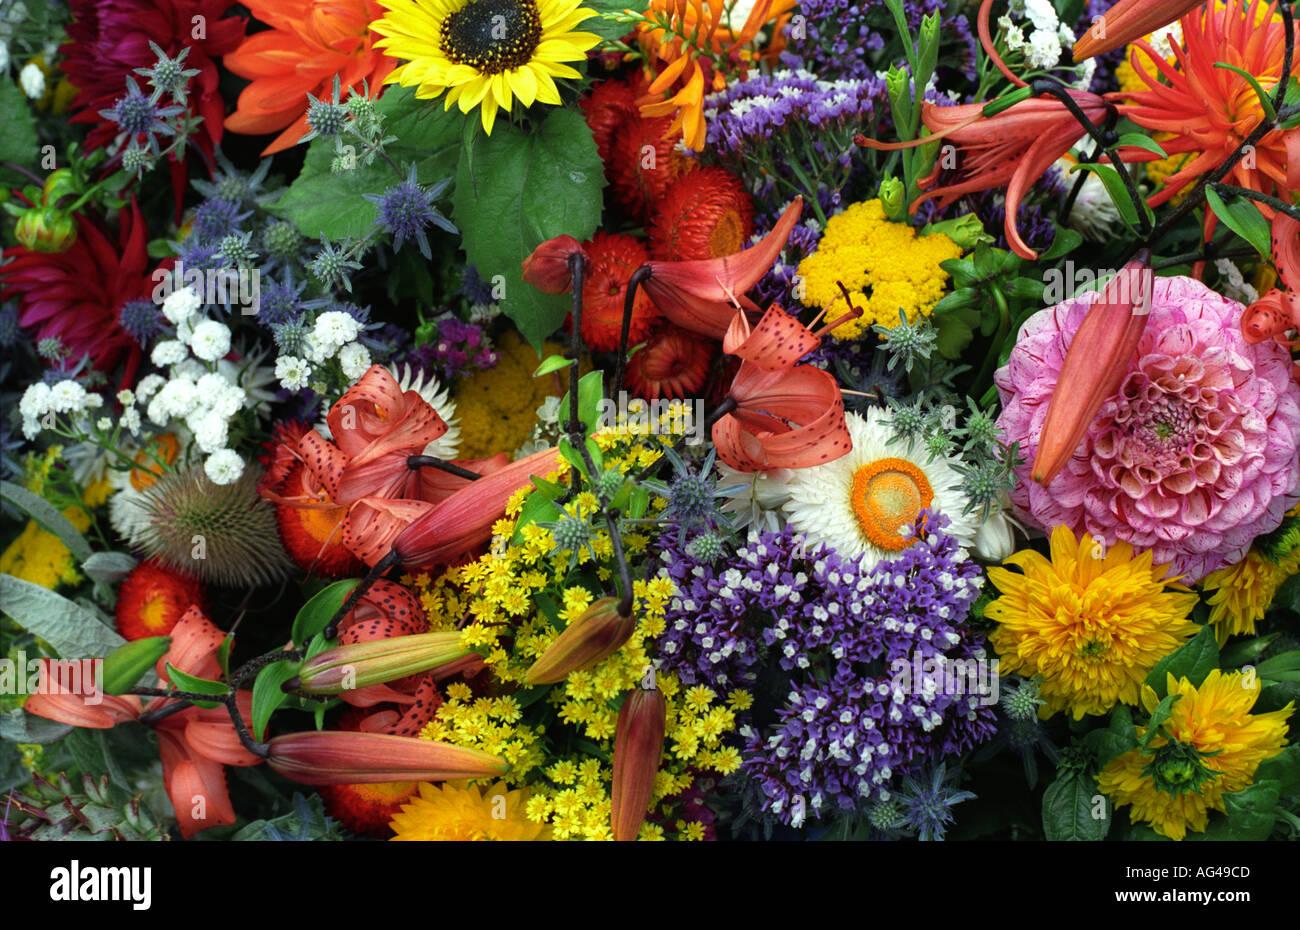 Mixed Bunch Of Spring Flowers Tasmania Australia Australian 1765